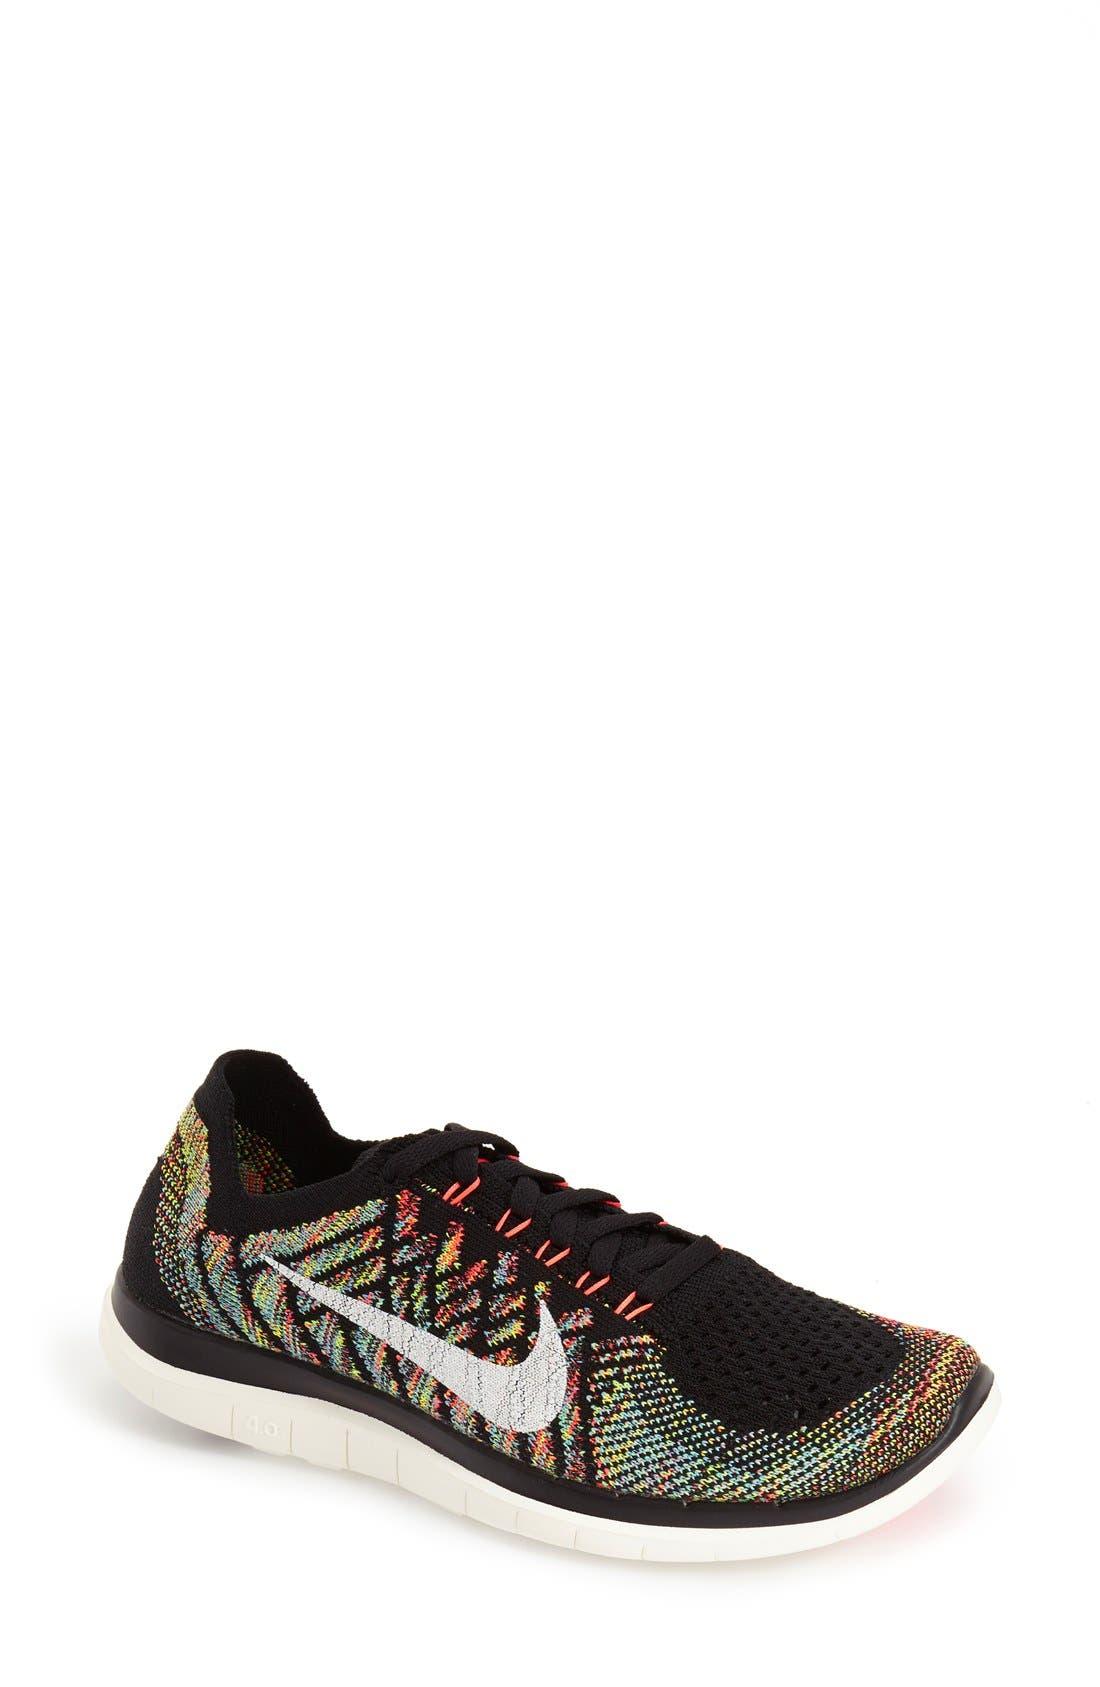 'Free 4.0 Flyknit' Running Shoe,                         Main,                         color, Black/ Orange/ Blue